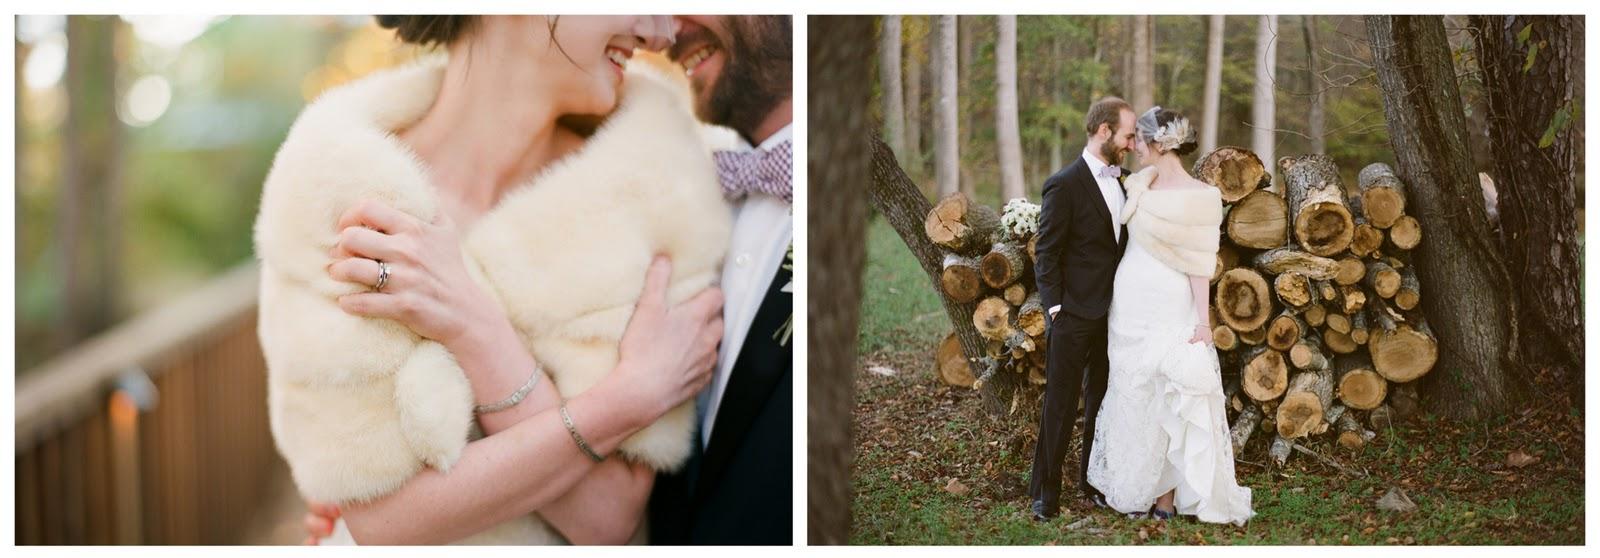 Jennifer and devin wedding